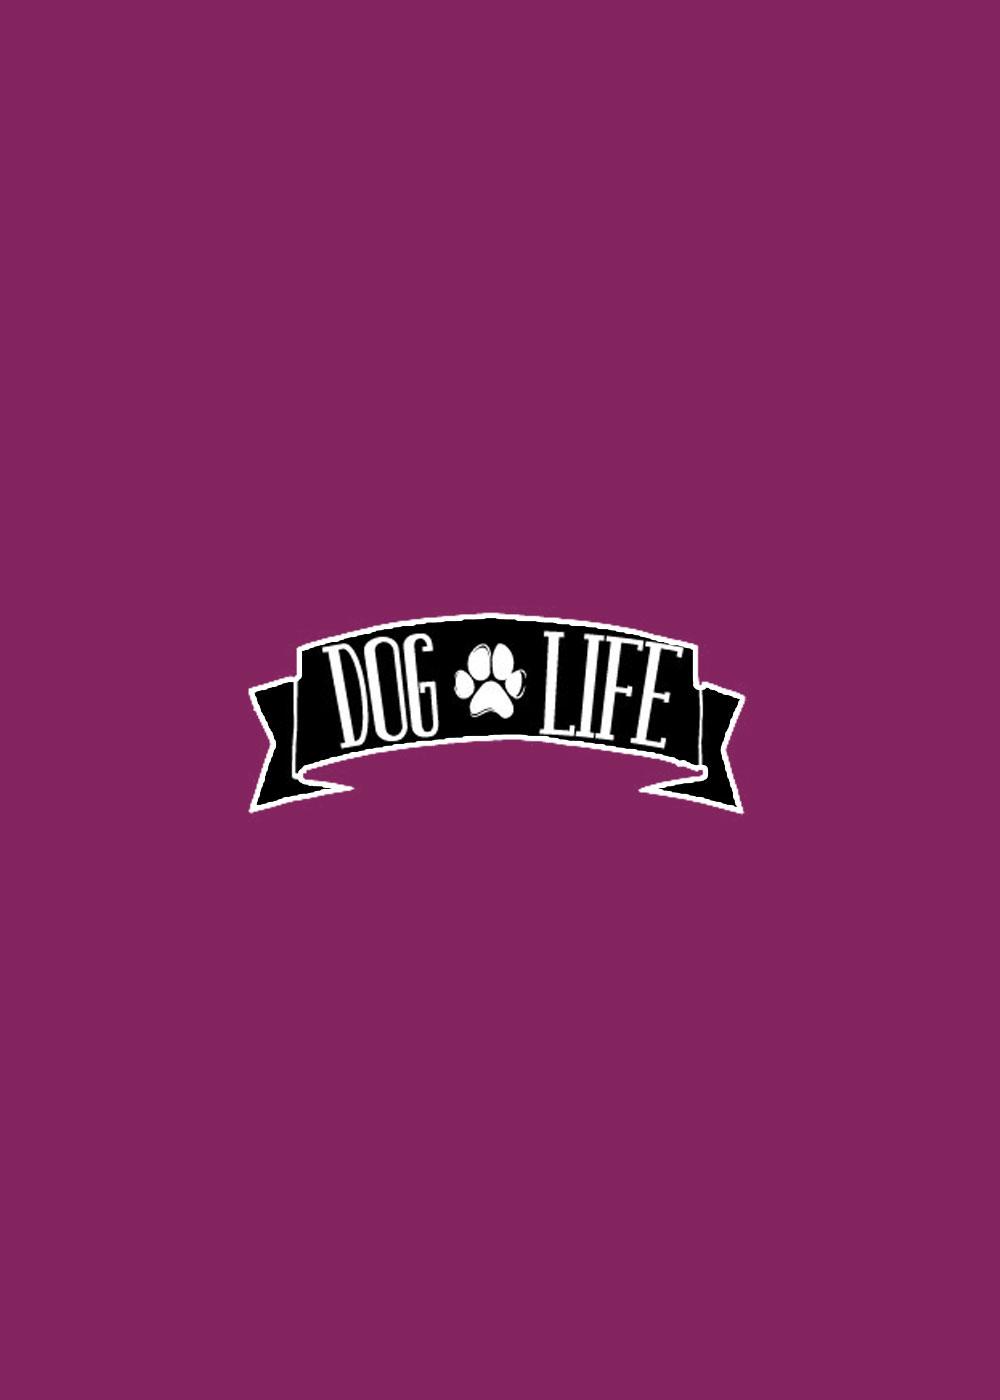 doglife.jpg